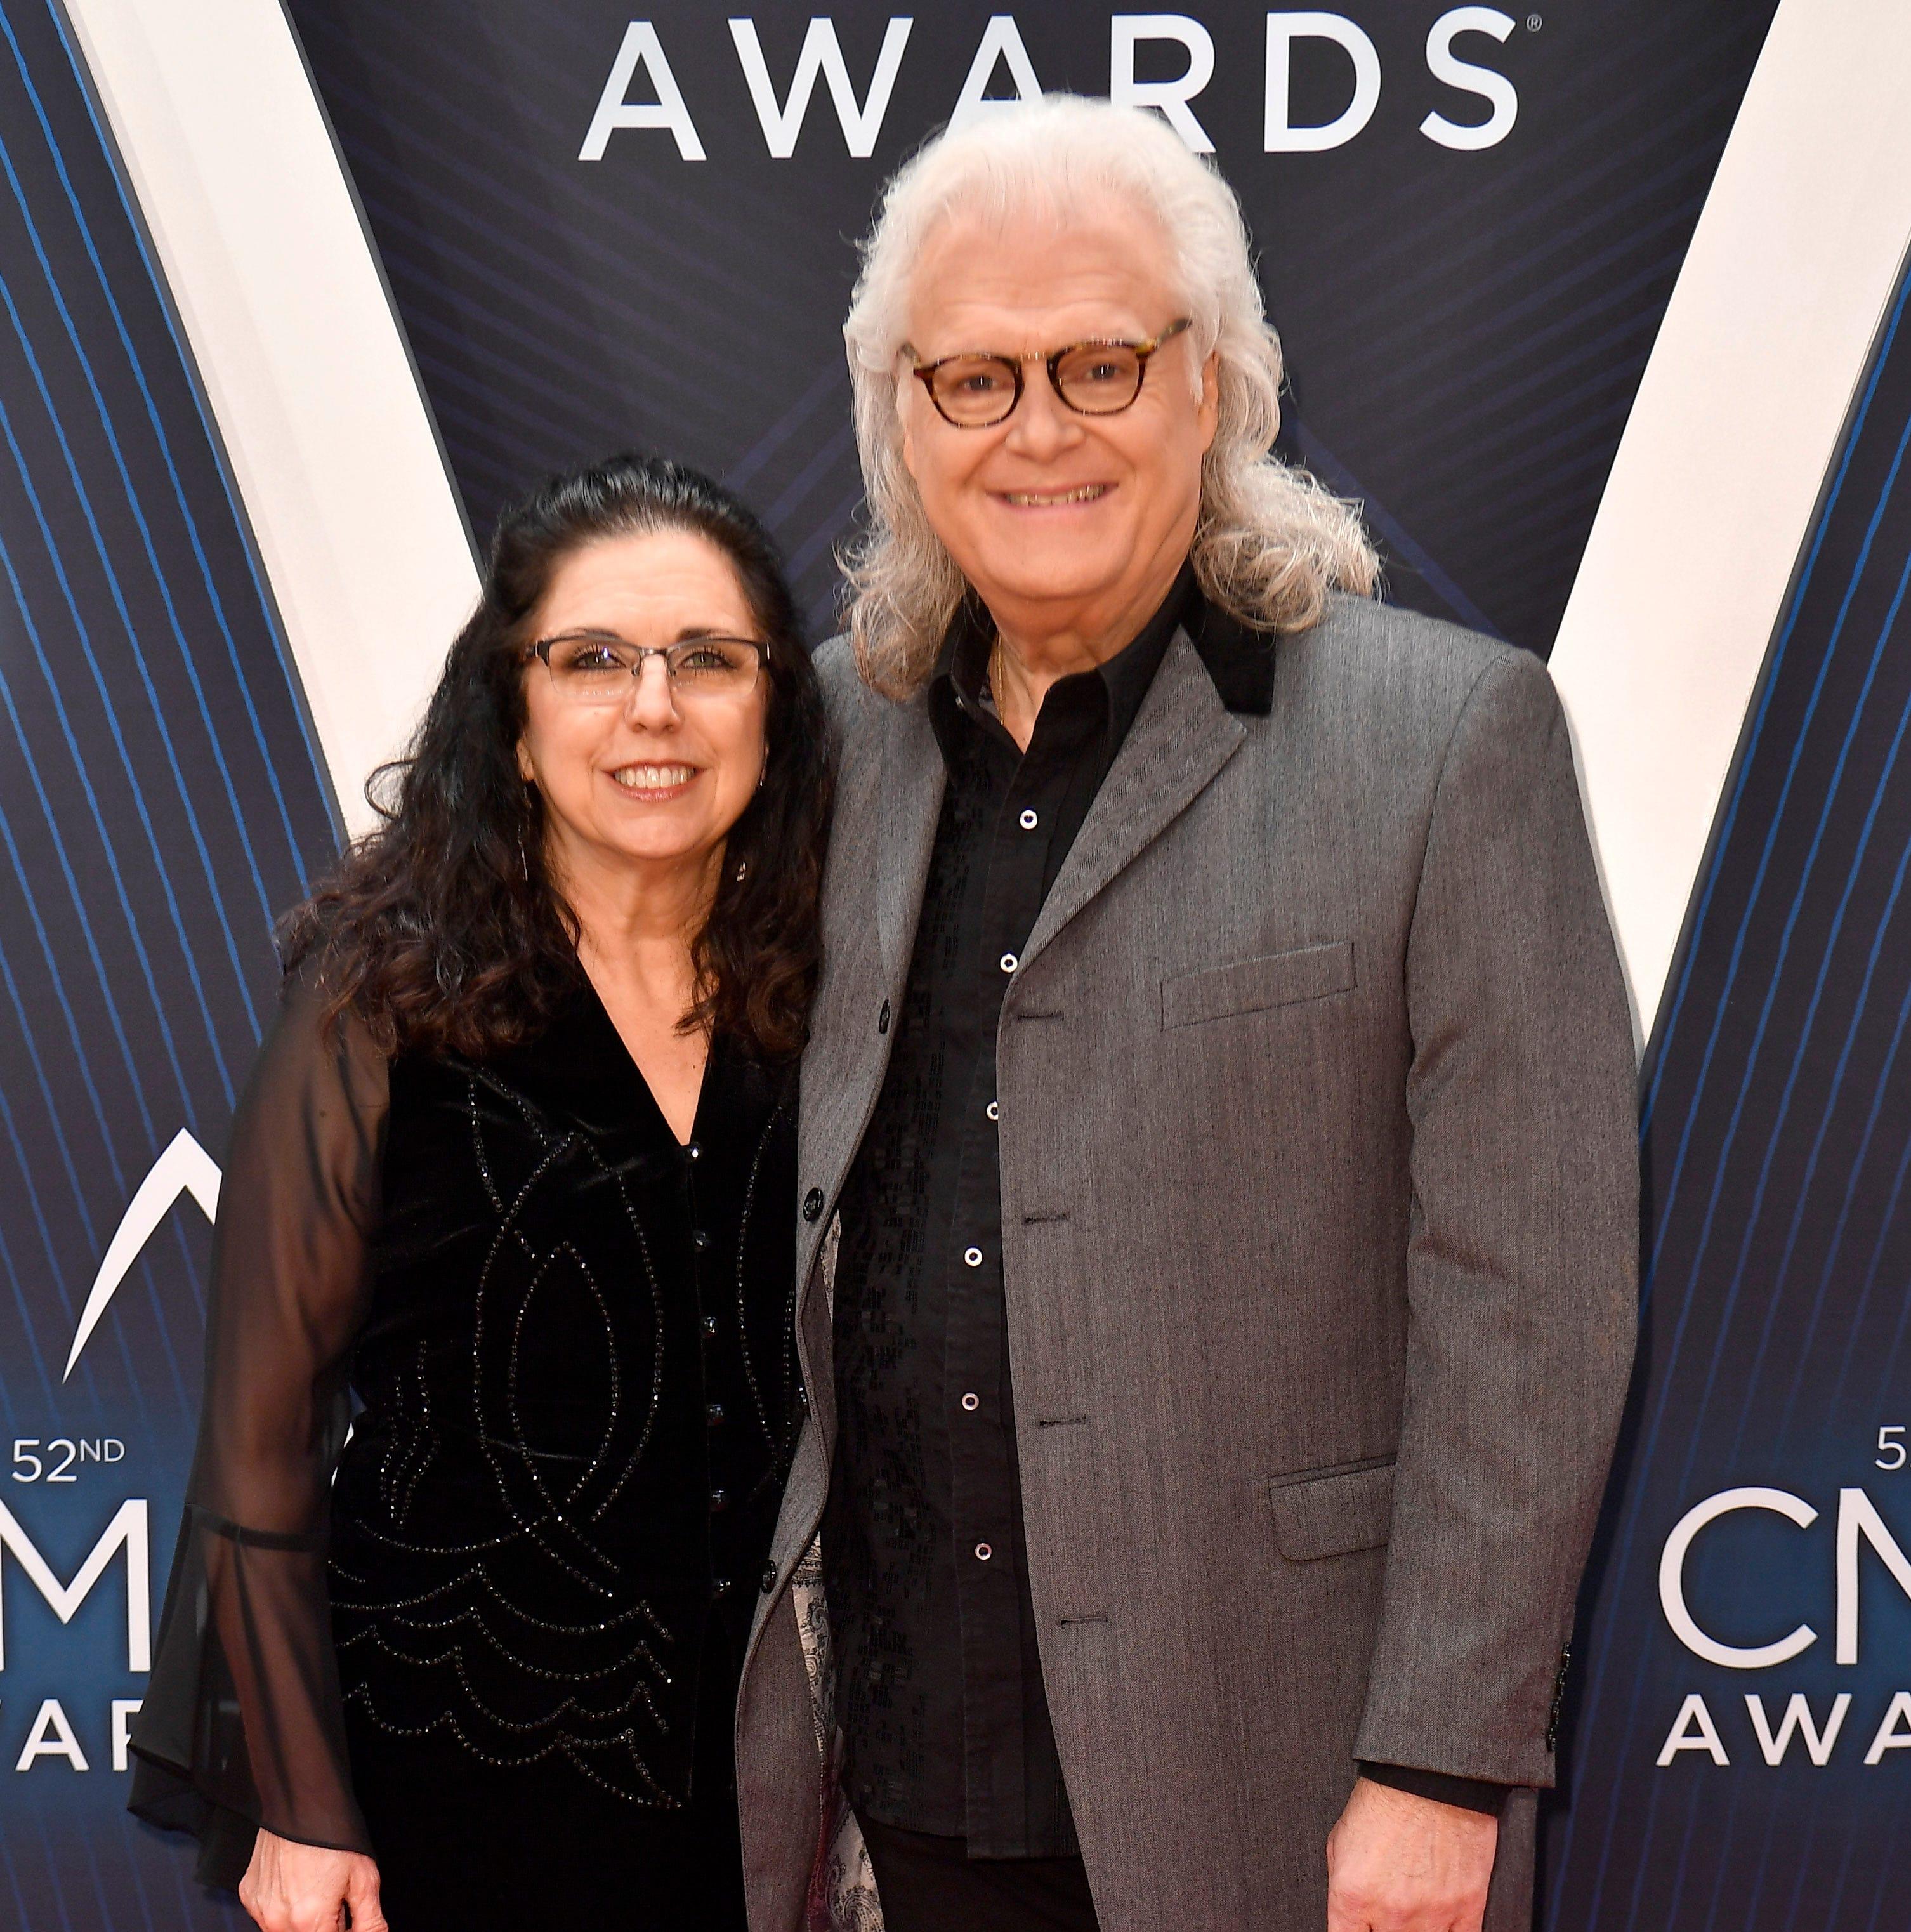 CMA Awards 2018: Stars salute Ricky Skaggs